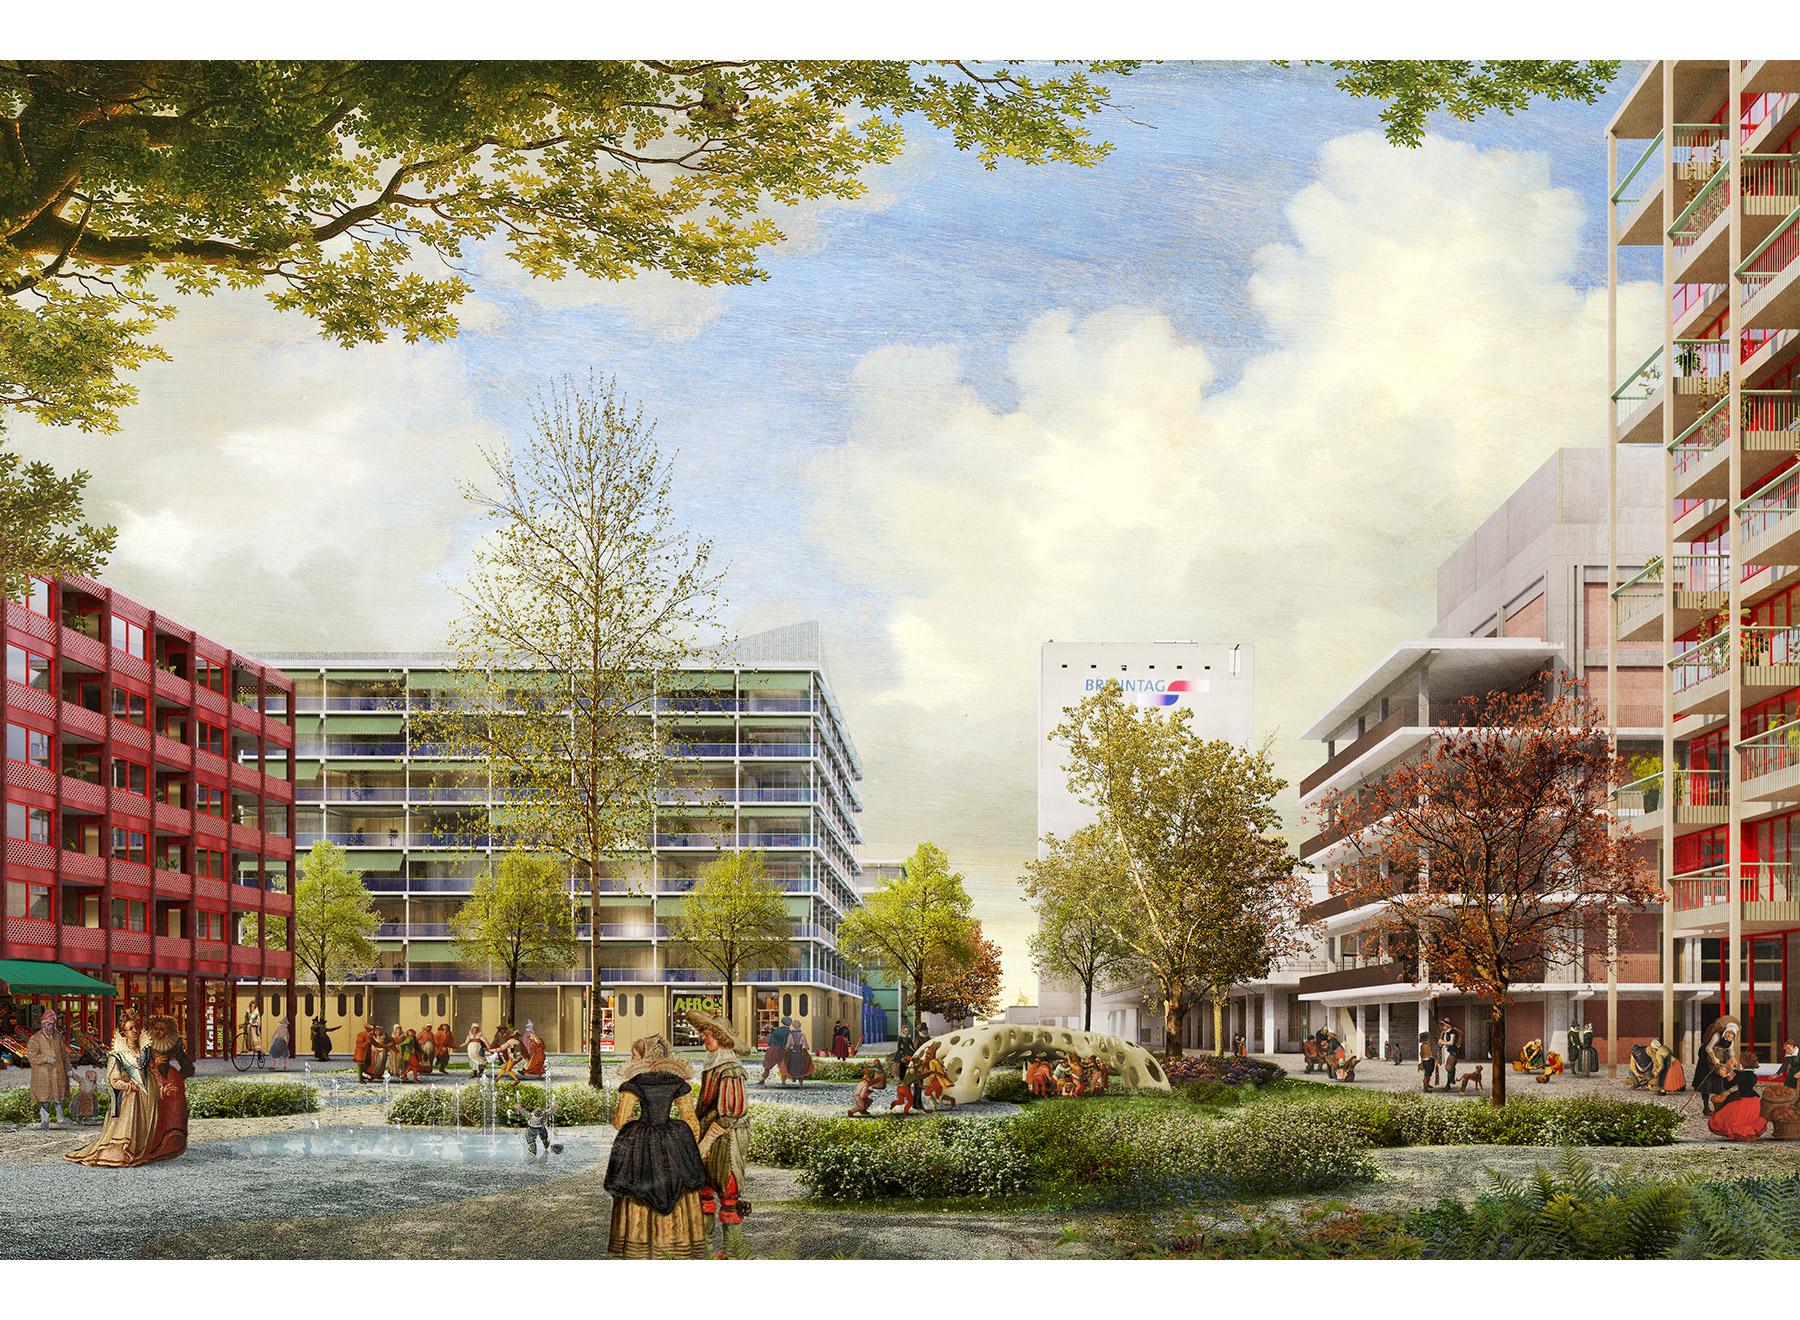 Place Jardin, rendering: Ponnie Images